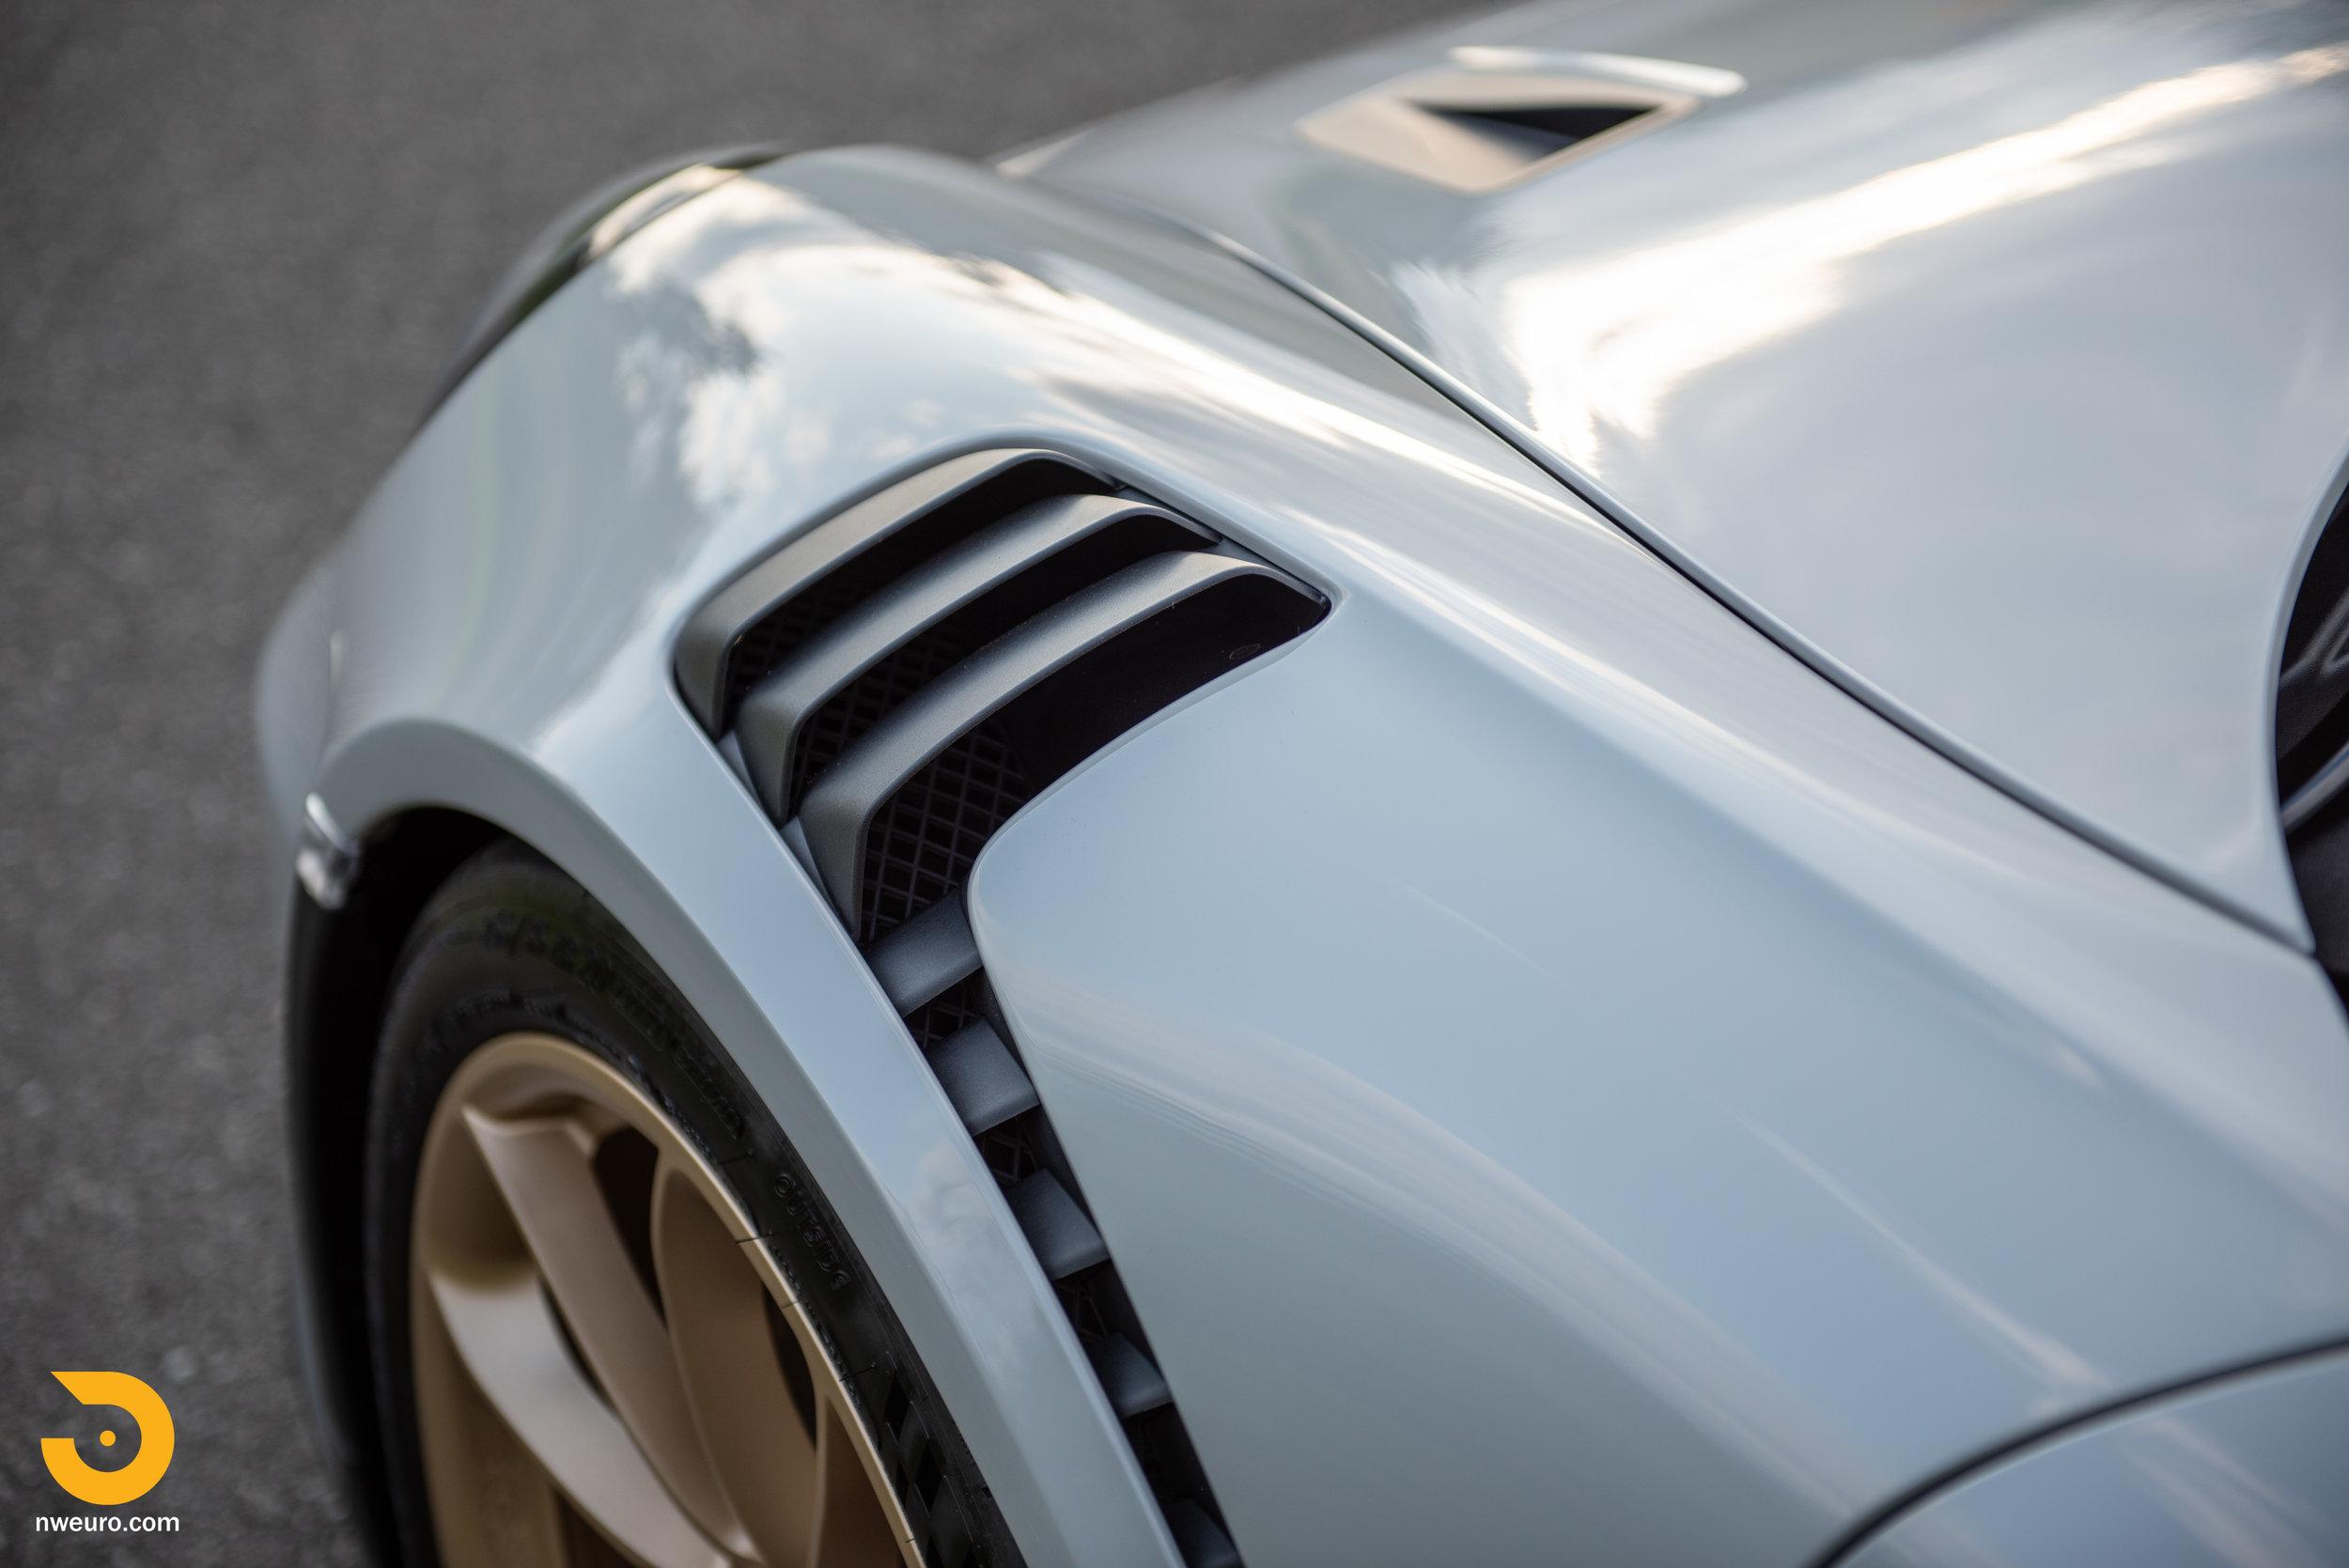 2019 Porsche GT3 RS - Chalk-73.jpg